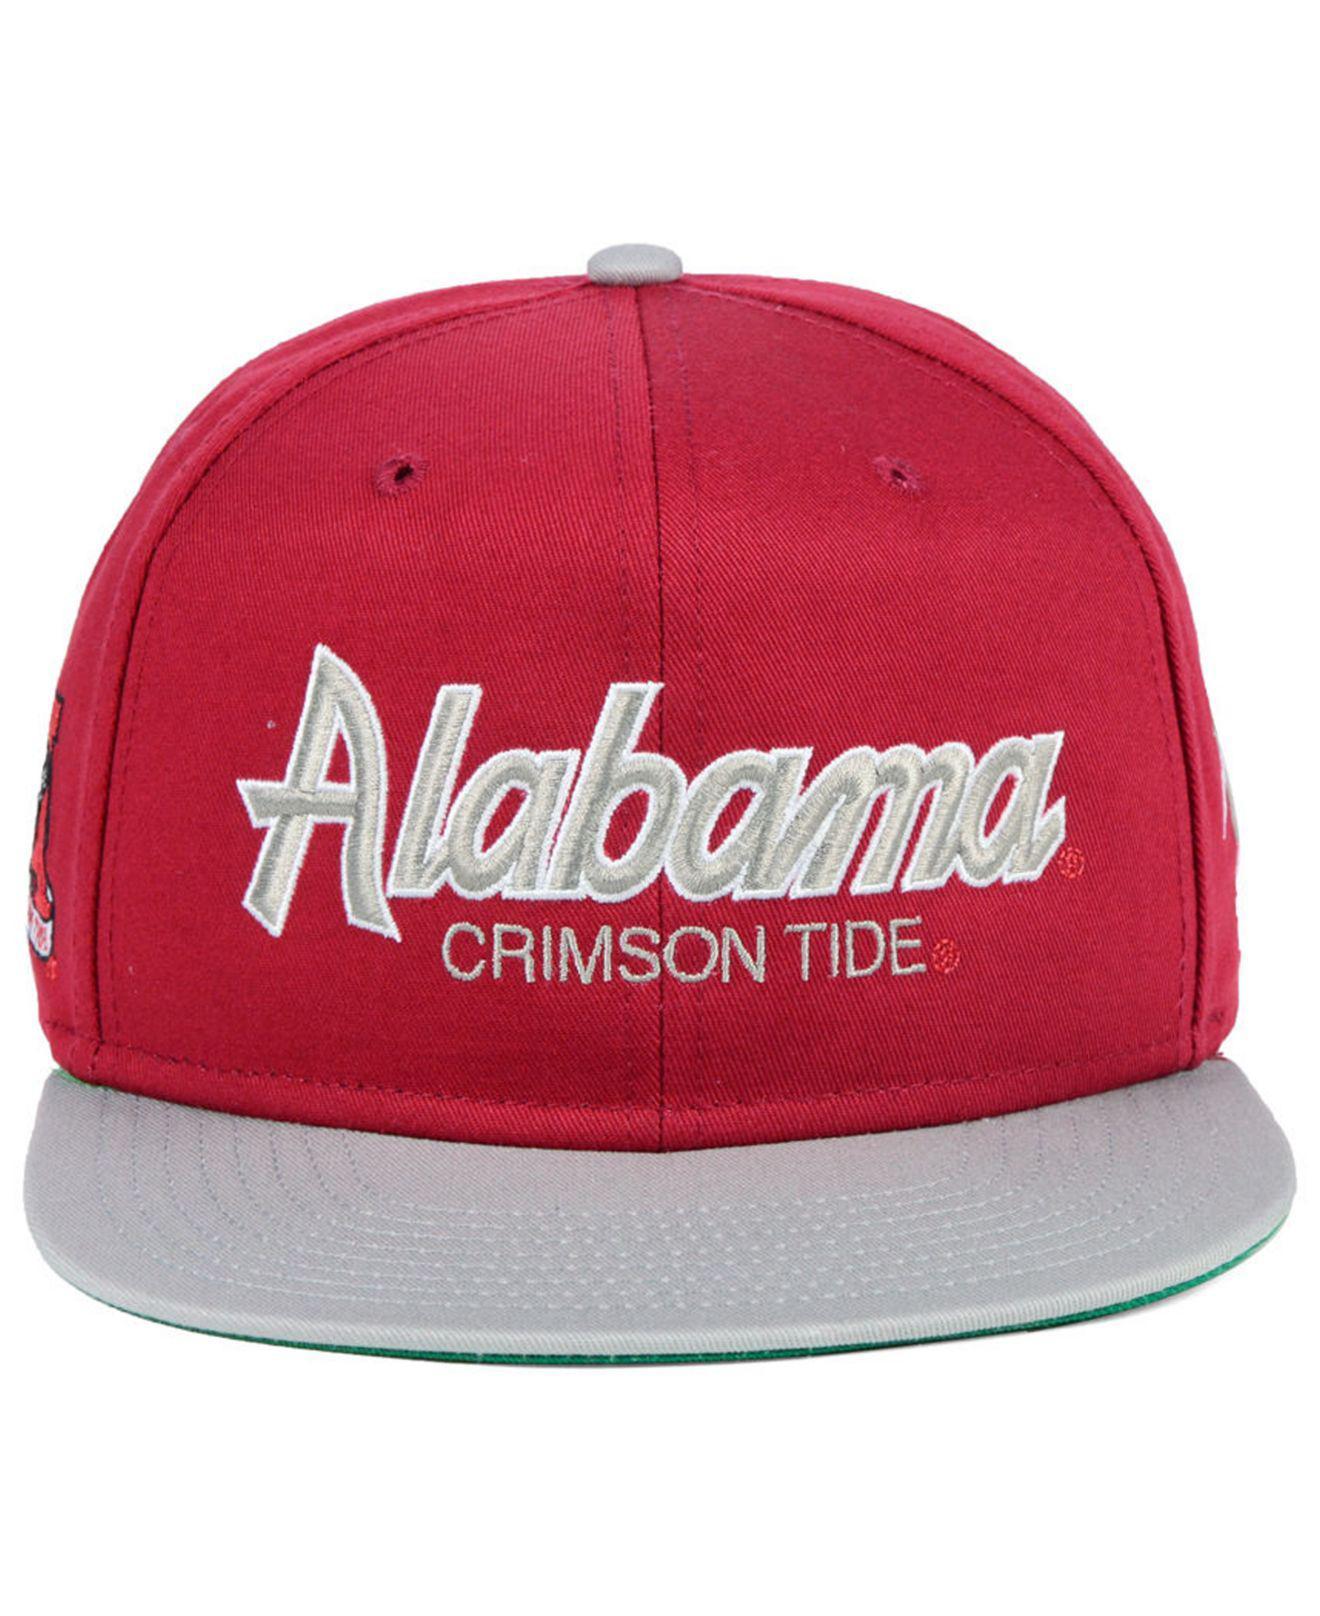 4a8a76c468d Lyst - Nike Alabama Crimson Tide Sport Specialties Snapback Cap in Red for  Men